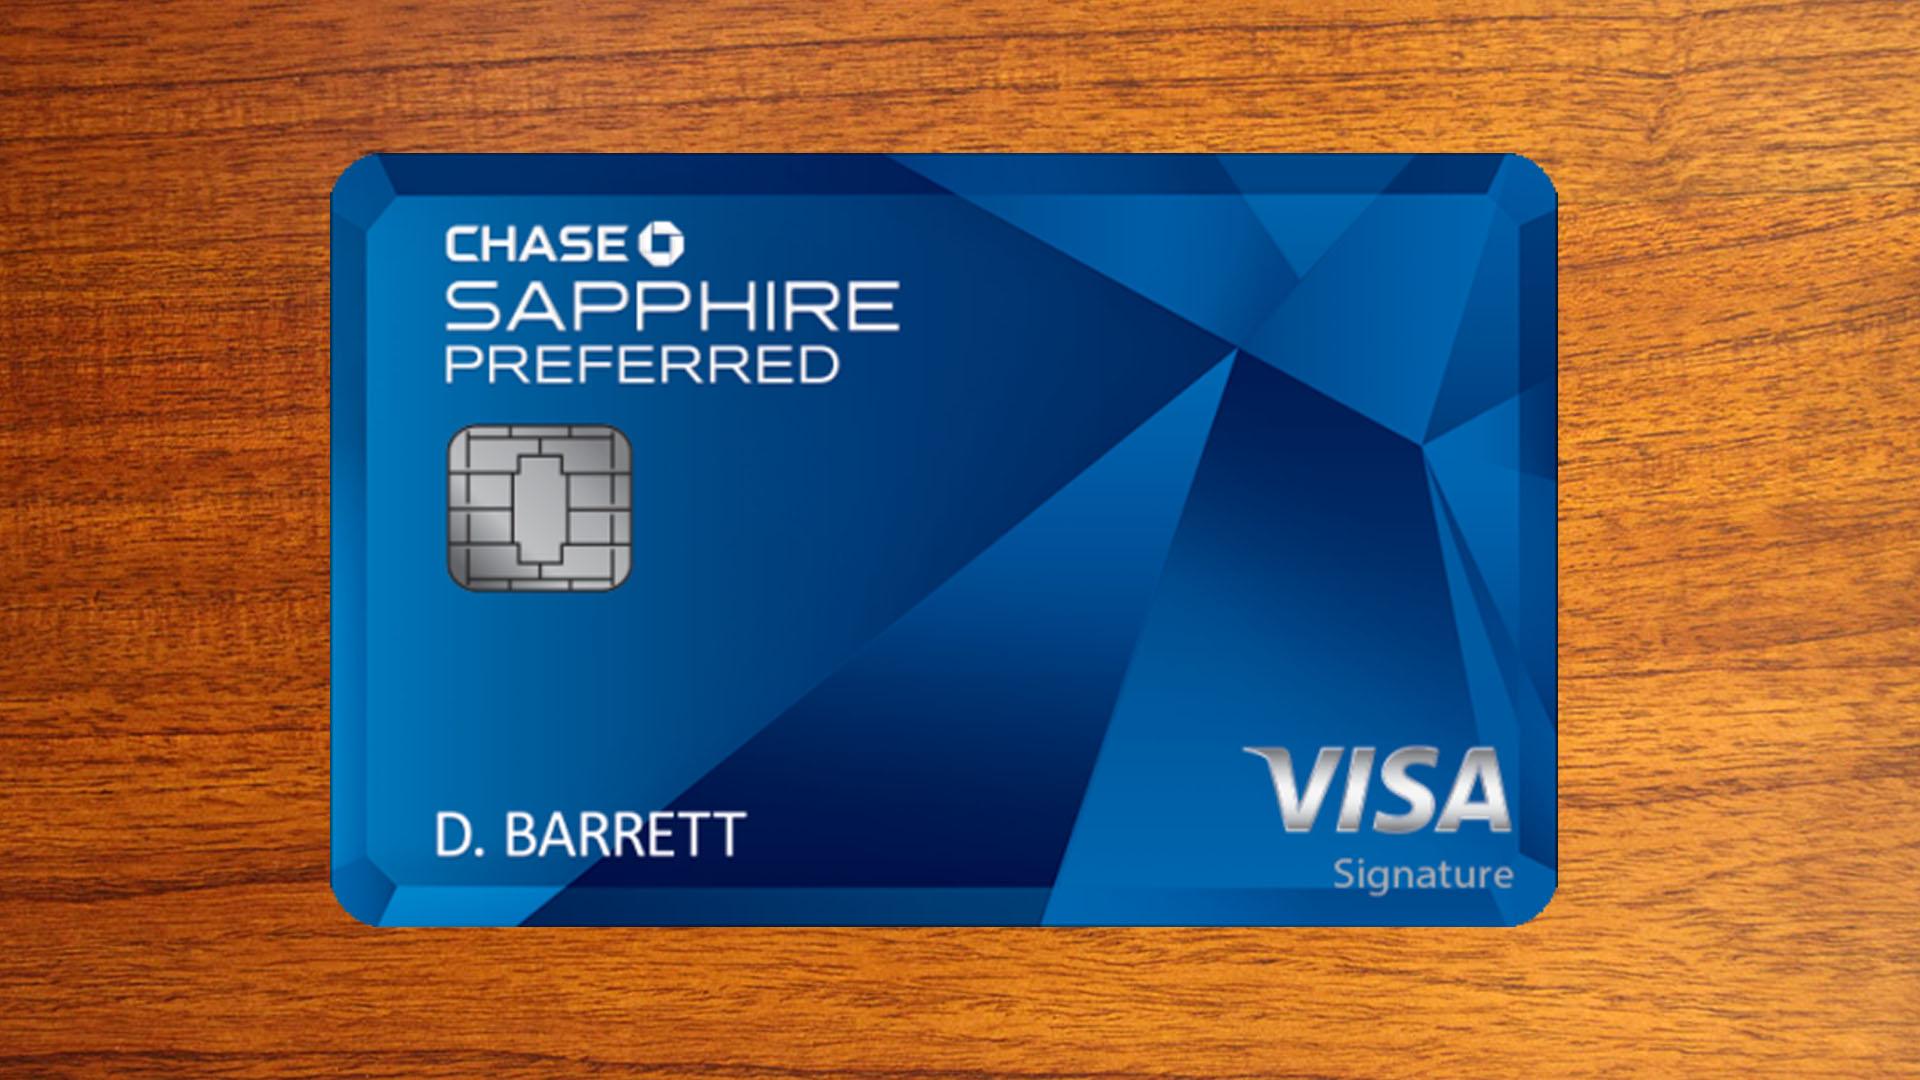 Chase Ends AU Bonus on the Sapphire Preferred Card. Credit CardsNews